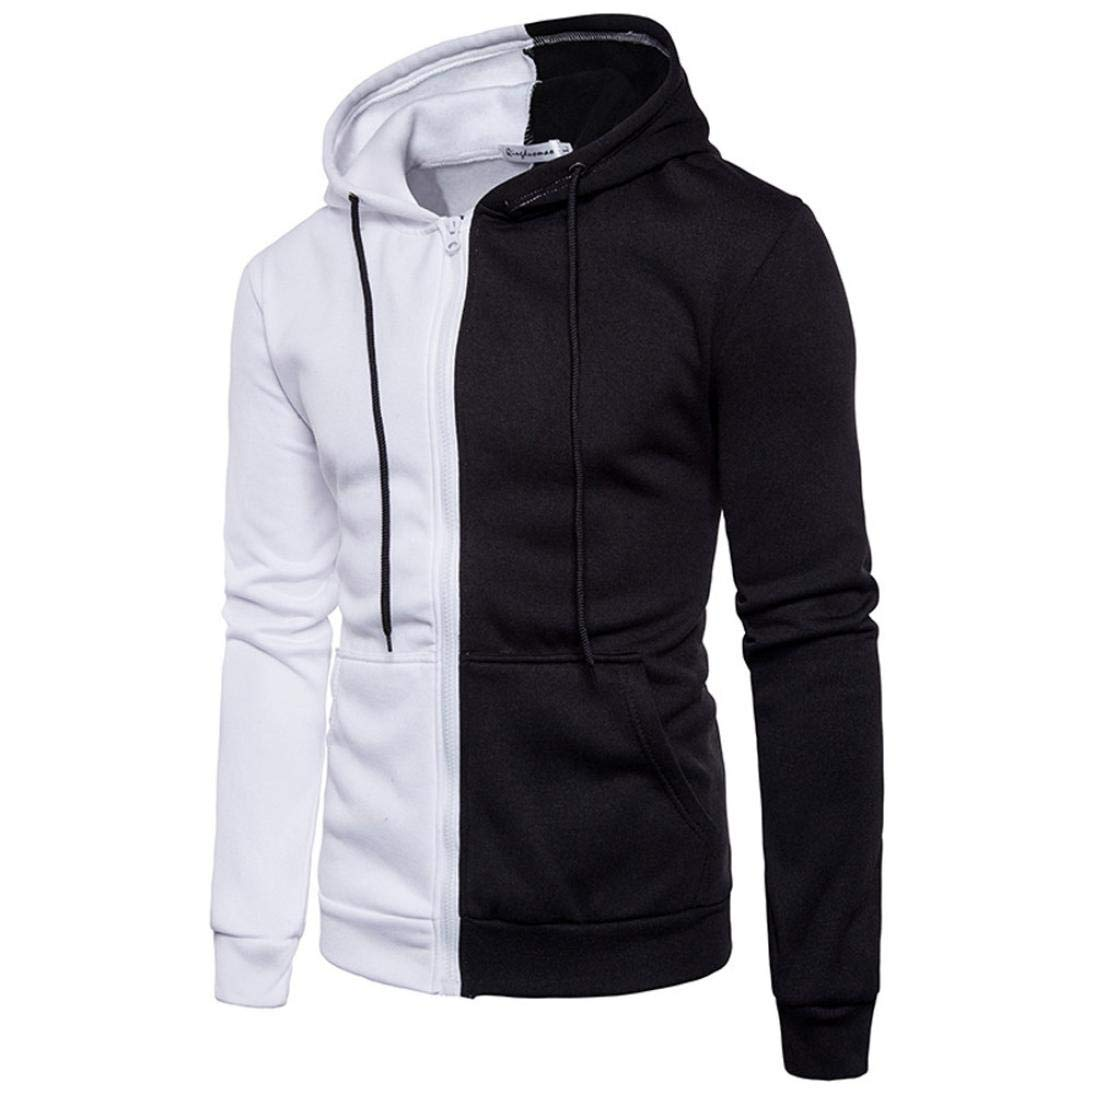 ab3c84ae503c21 ... TIFIY Herren Langarm Hoodie Nähte Reißverschluss Sport Mantel Moderne  Freizeit Jacke Outwear Sweatshirt Tops TIFIY- ...